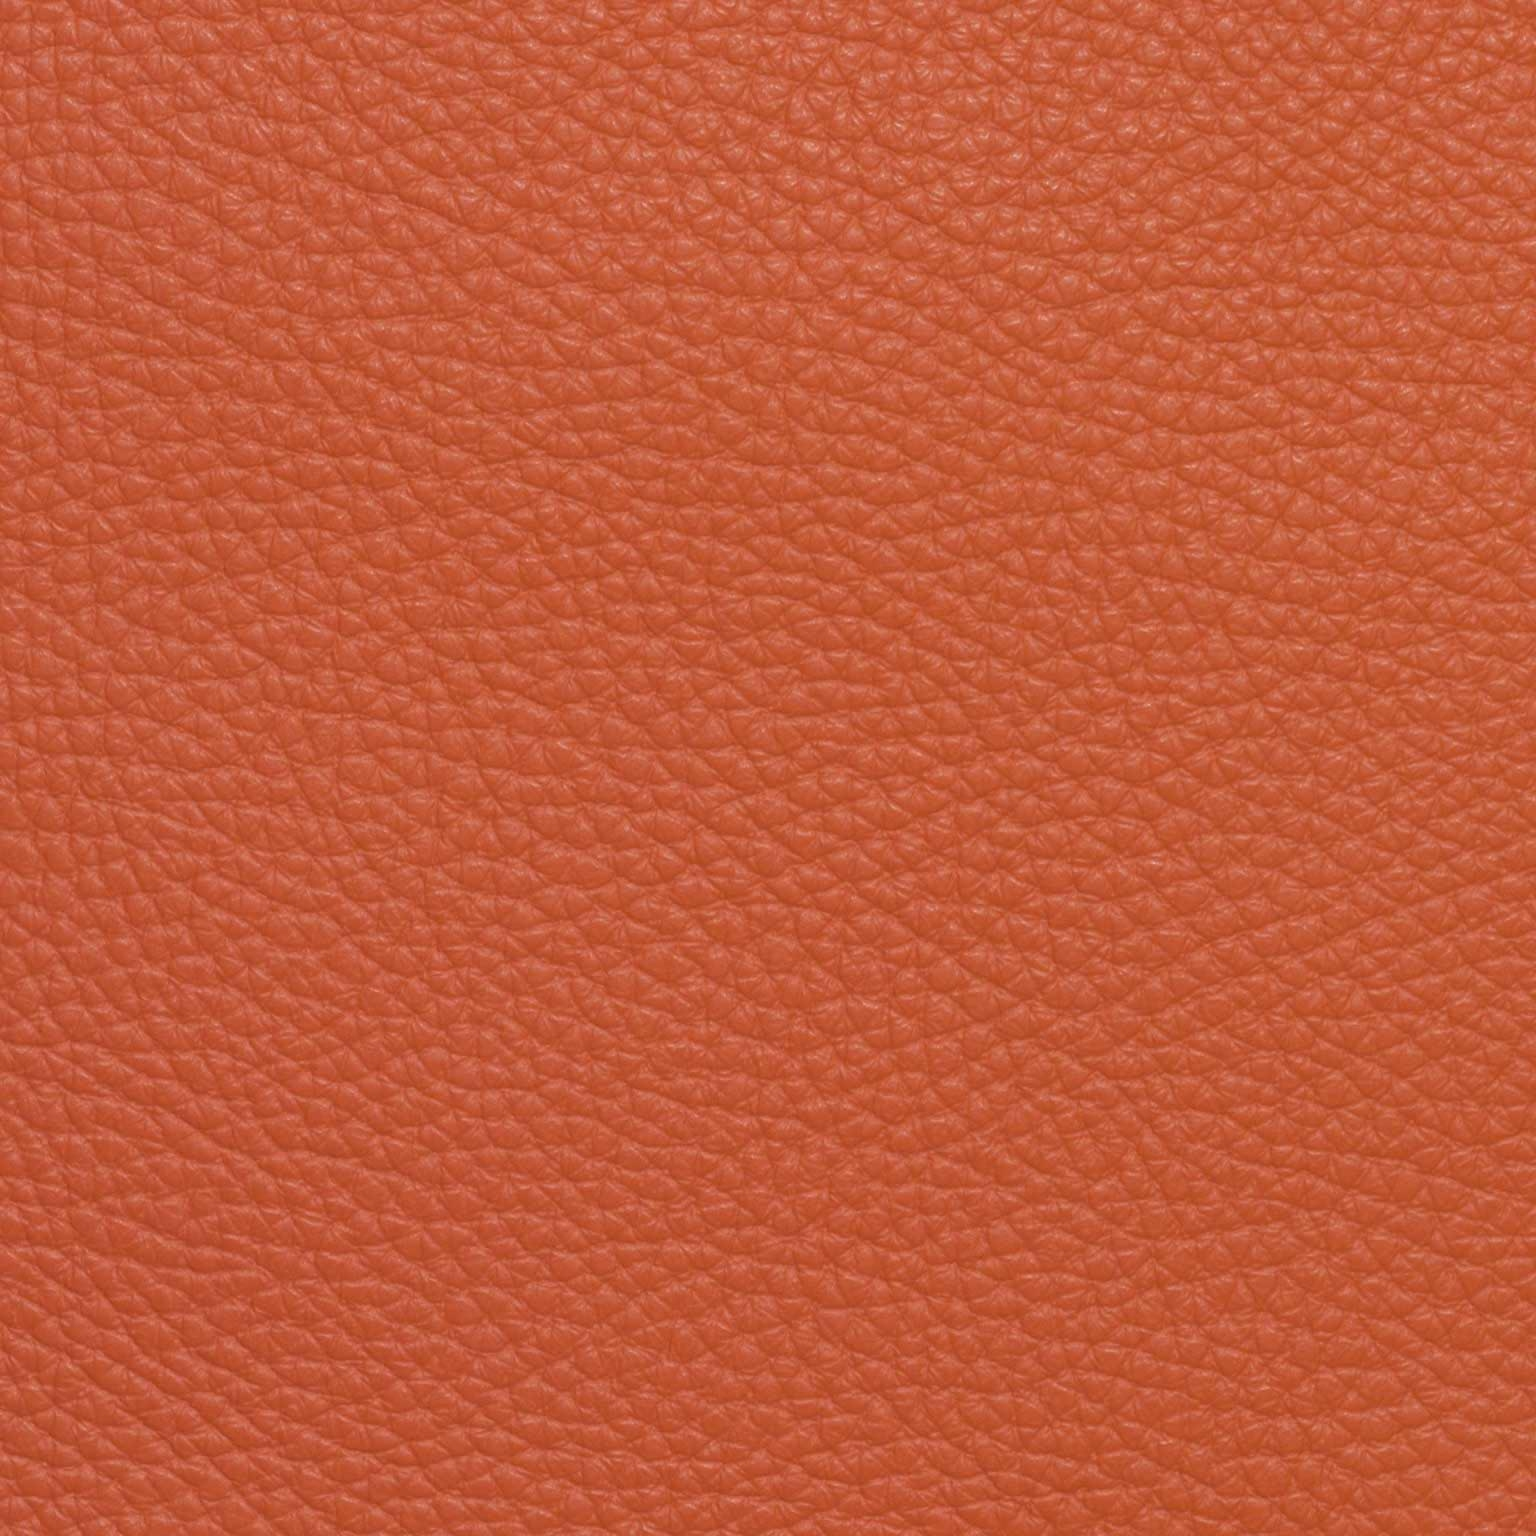 Ranchio leather_p11-011